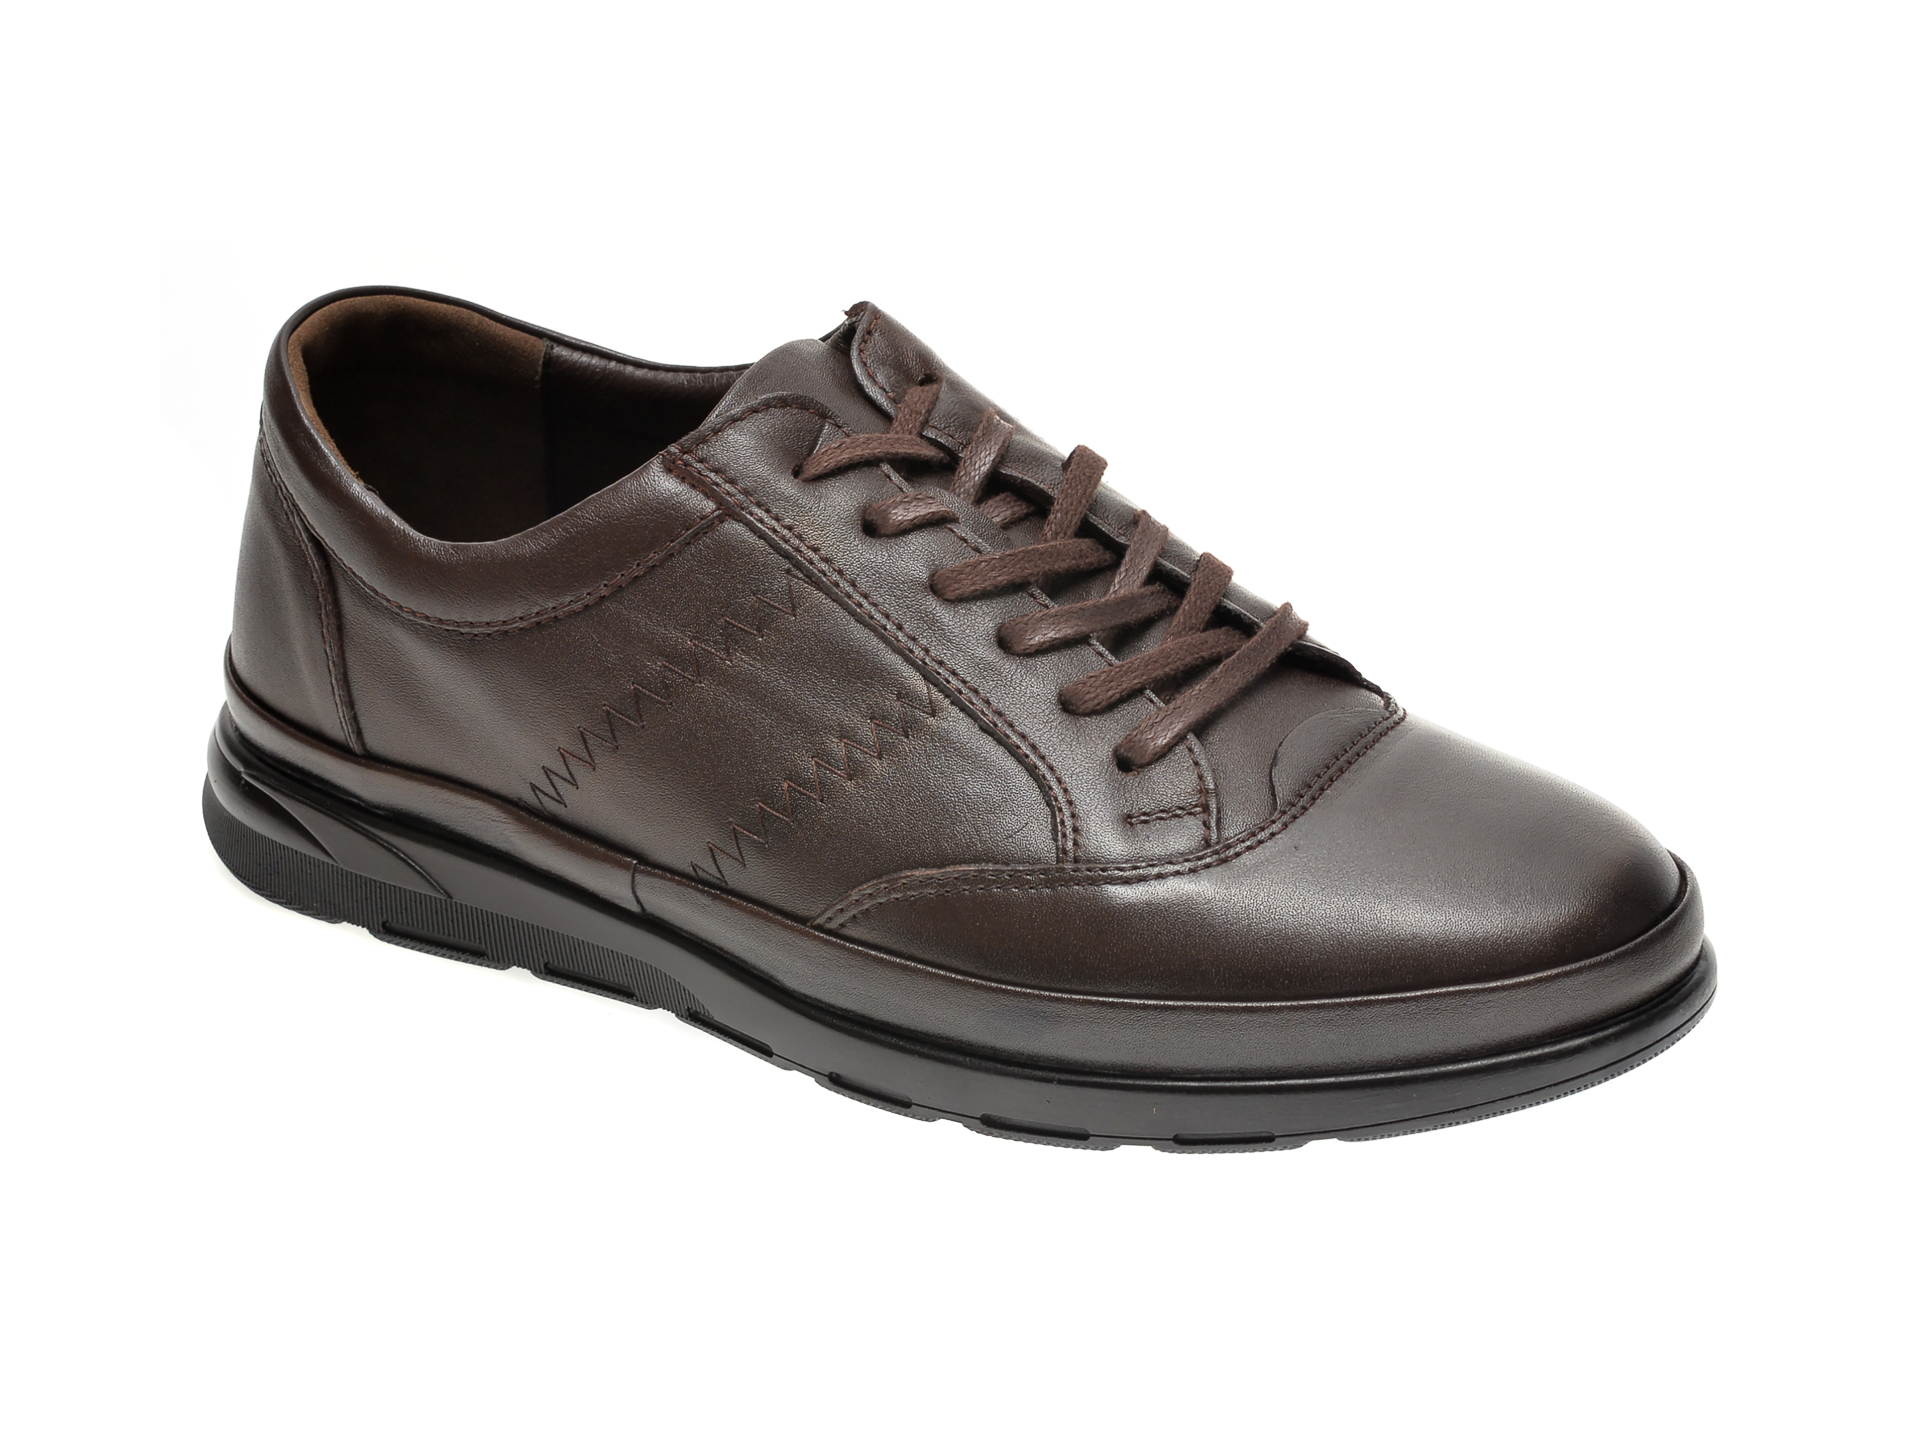 Pantofi OTTER maro, 1485, din piele naturala imagine